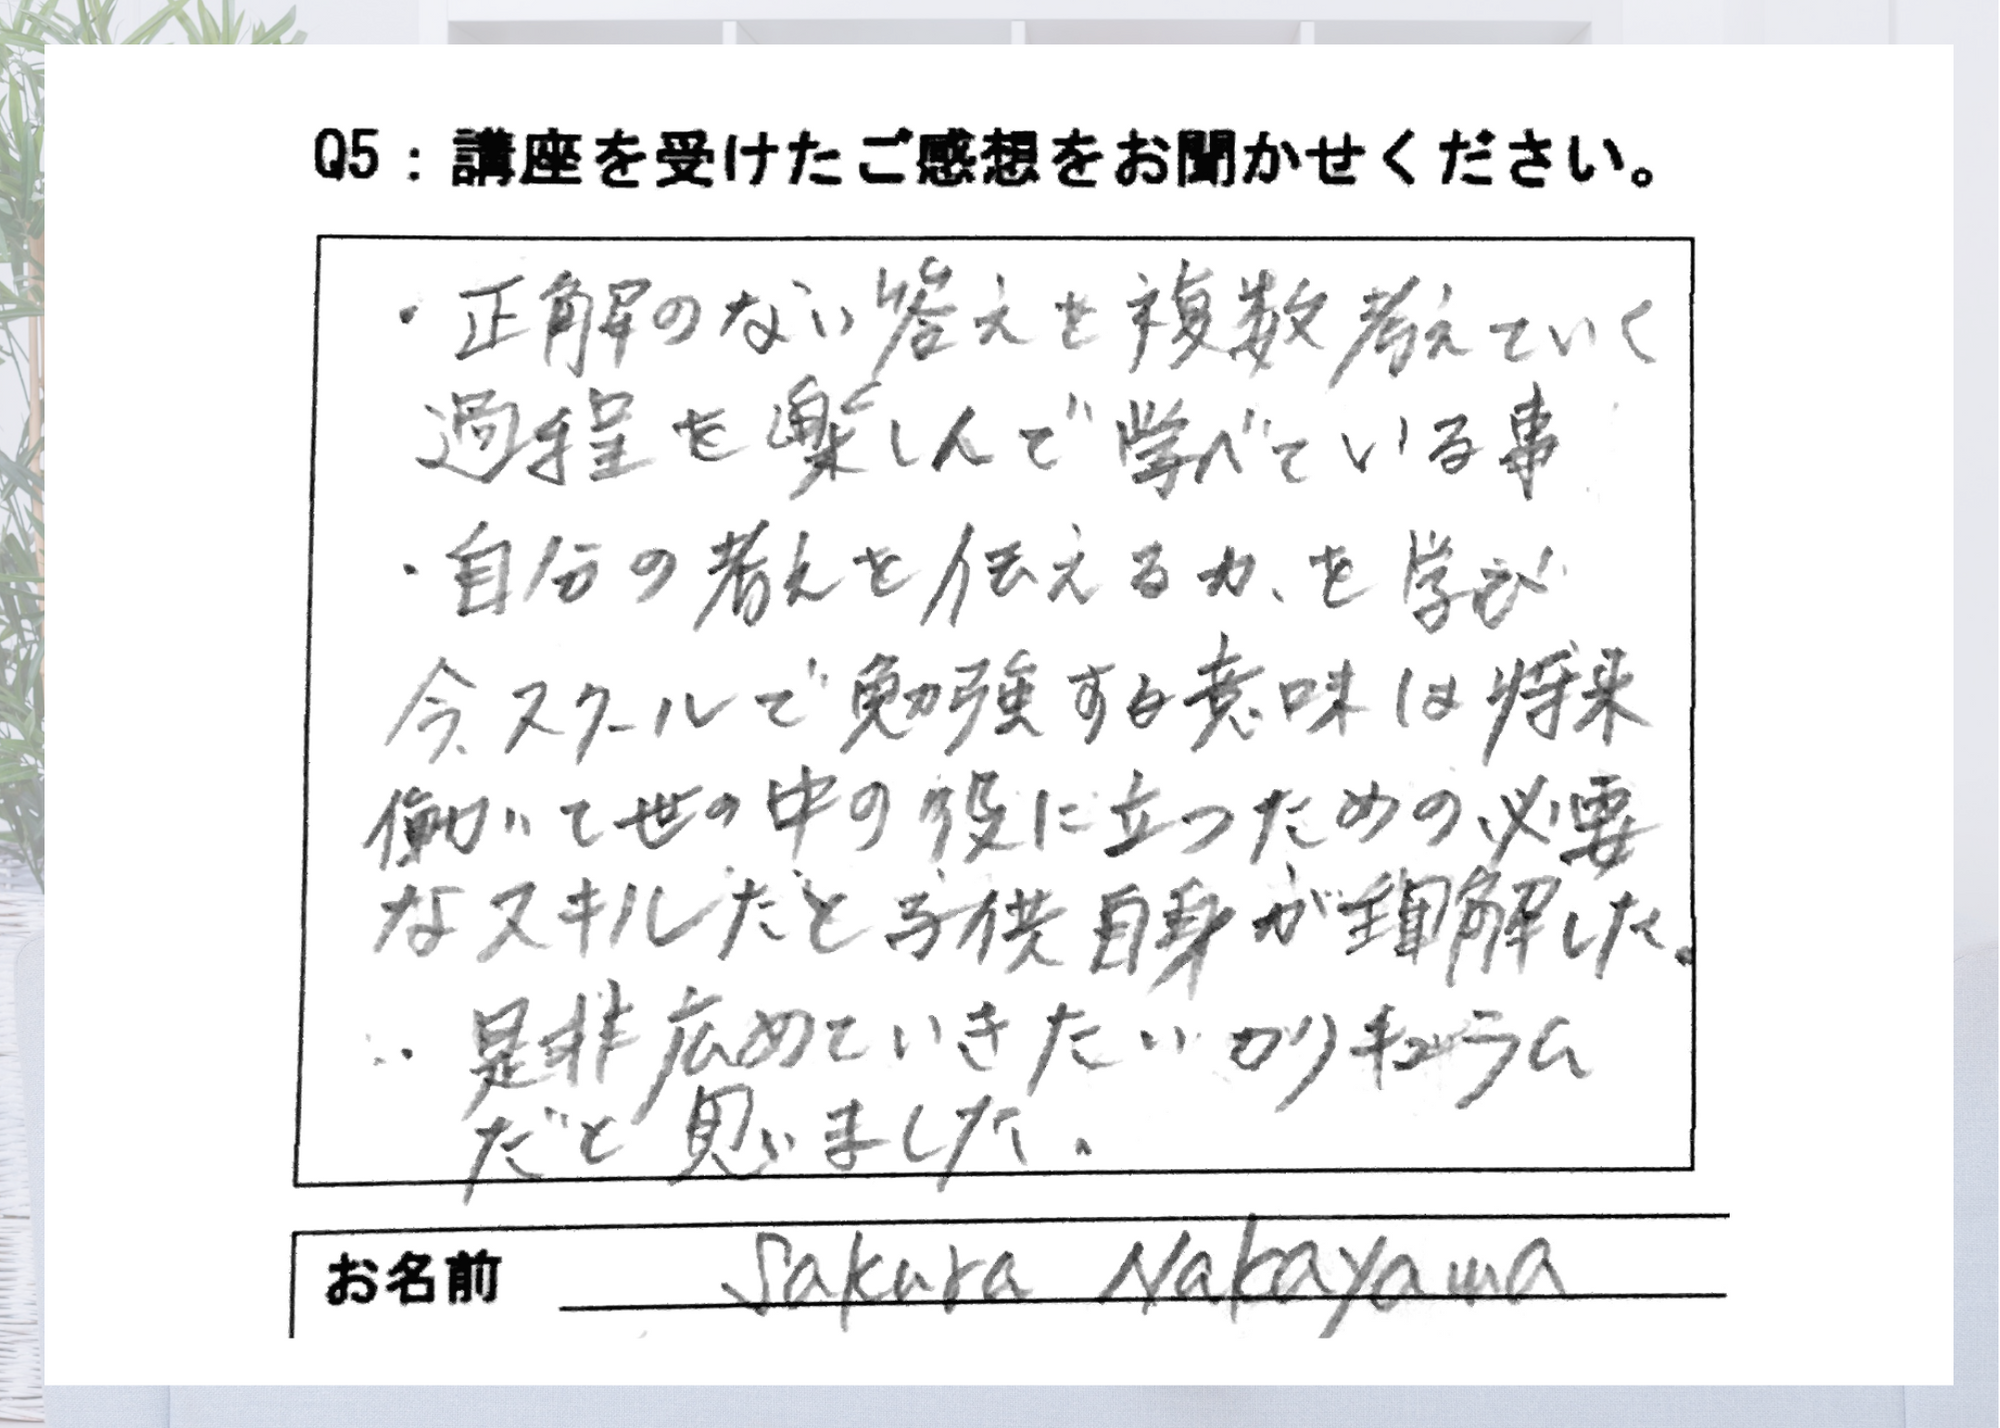 Sakura Nakayama 様